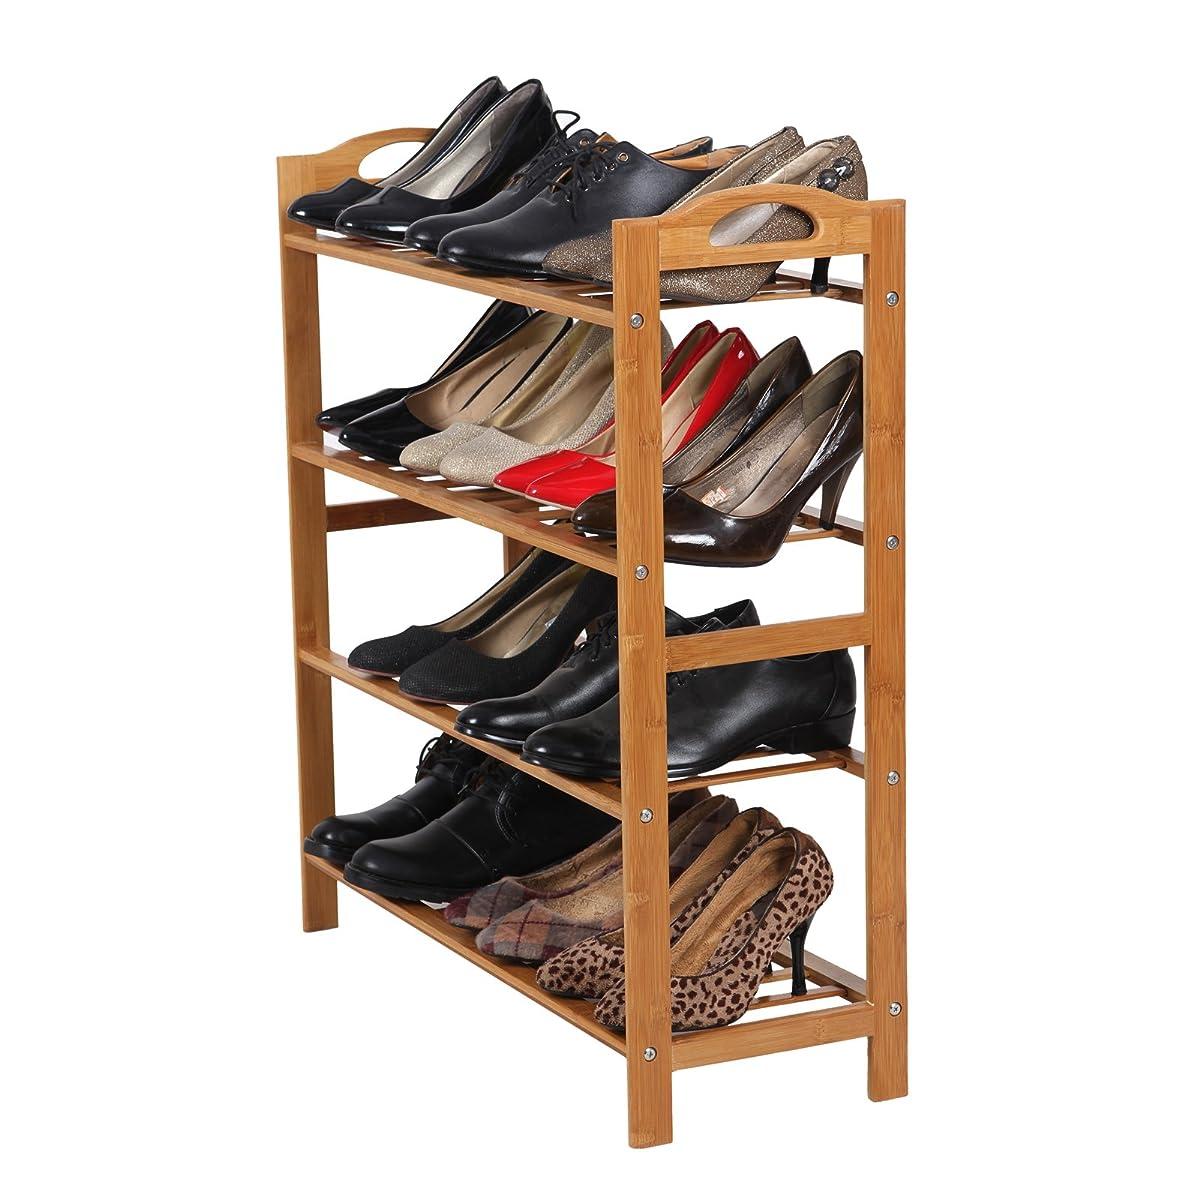 SONGMICS Bamboo Shoe Rack 4-Tier Entryway Shoe Shelf Storage Organizer ULBS94N